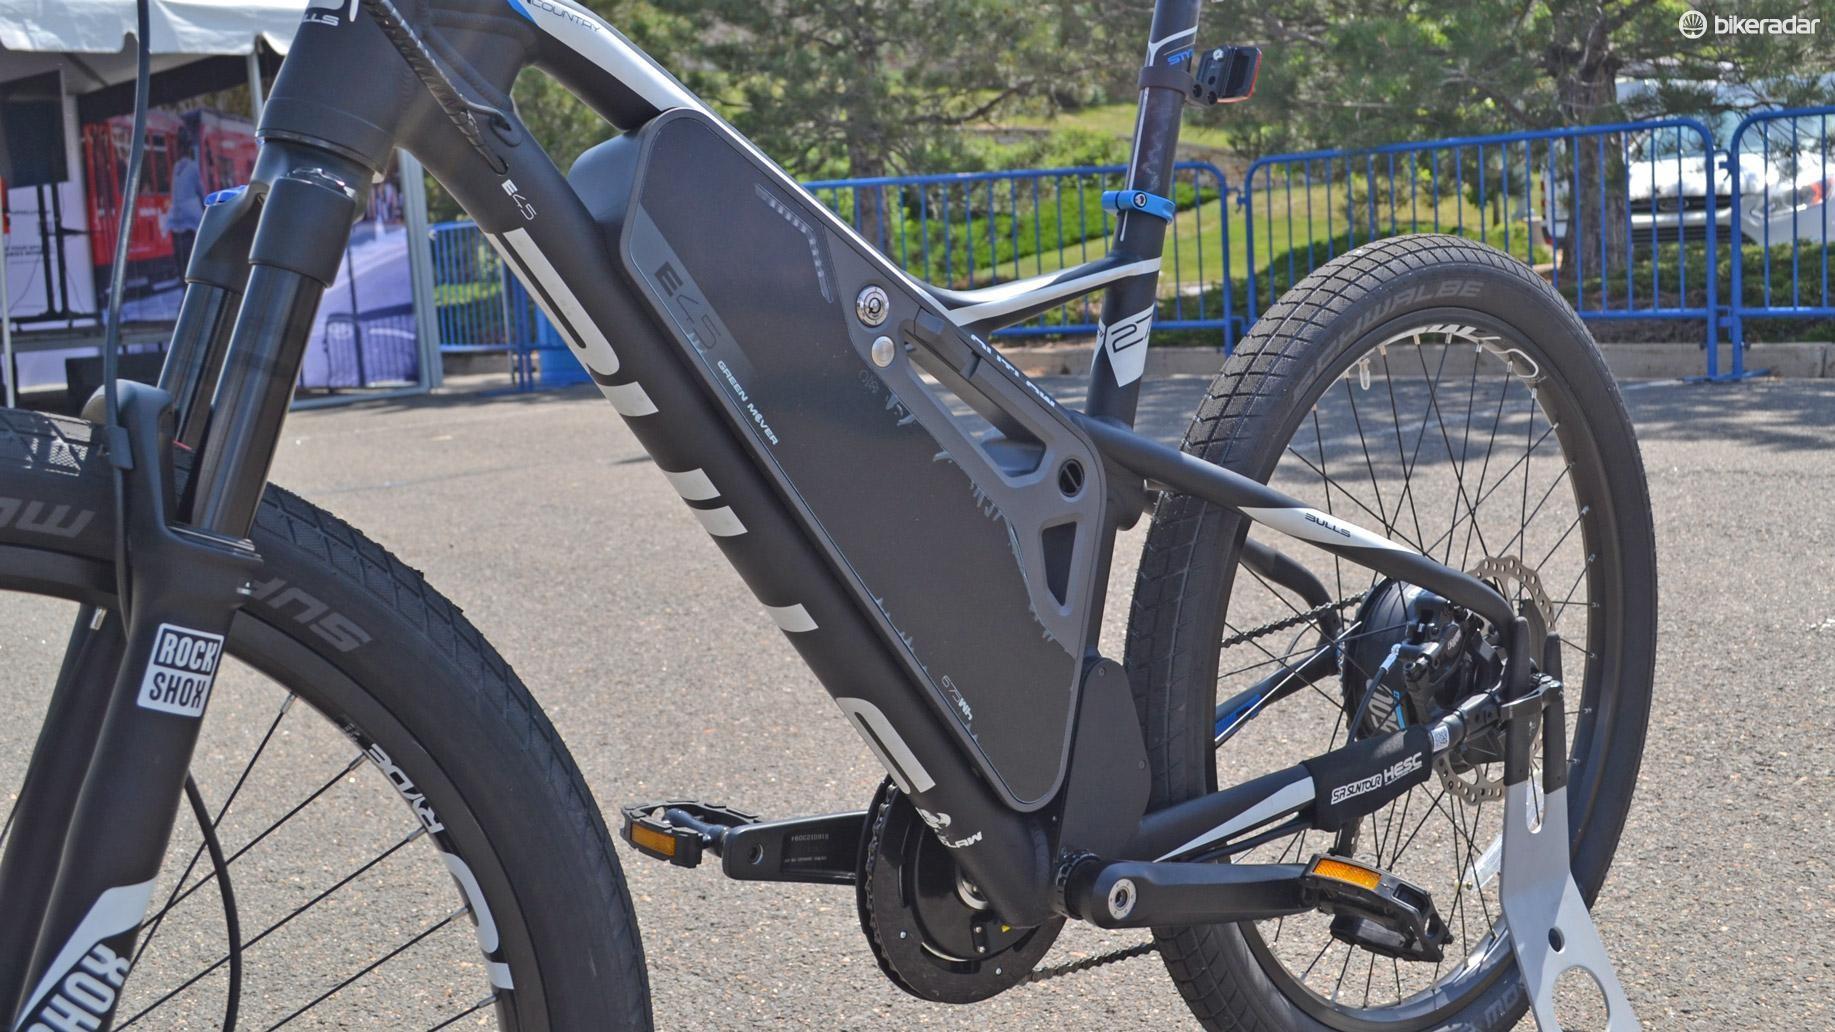 The SR Suntour battery supplies 670 watts and a 70-mile range